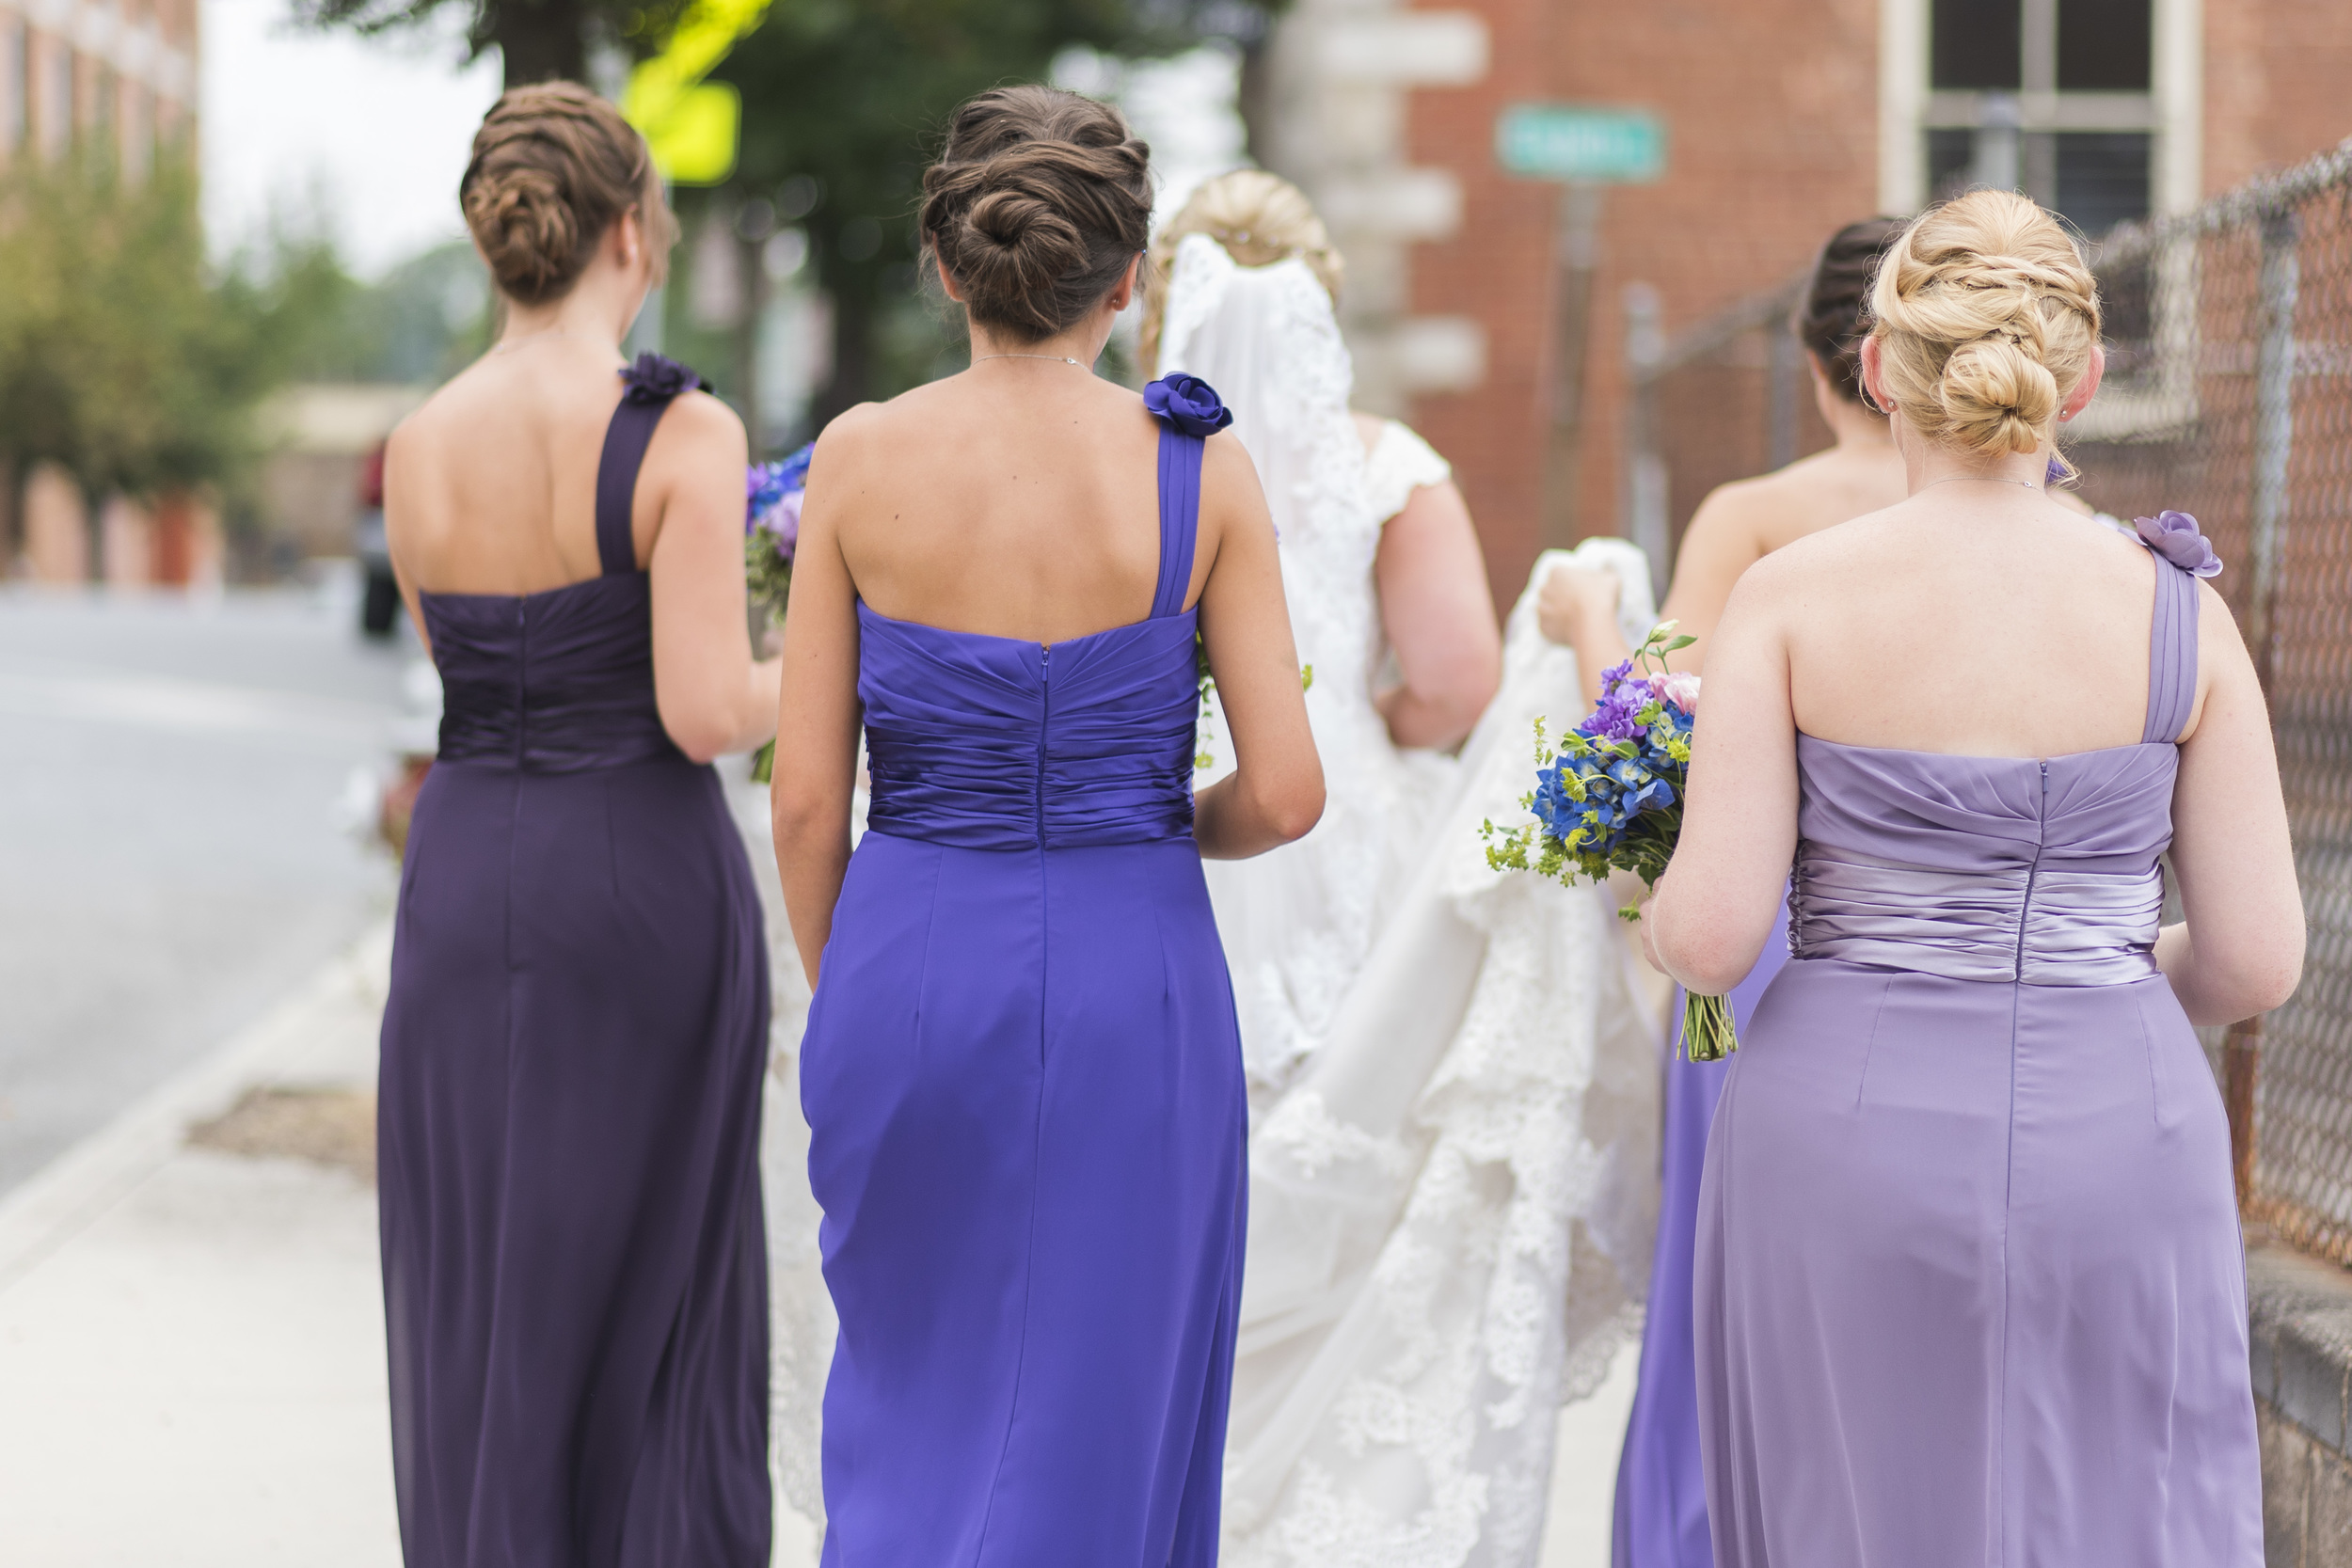 Lynchburg_VA_Wedding_Tresca on 8th_Downtown_Purple_elegant_Photos871.jpg